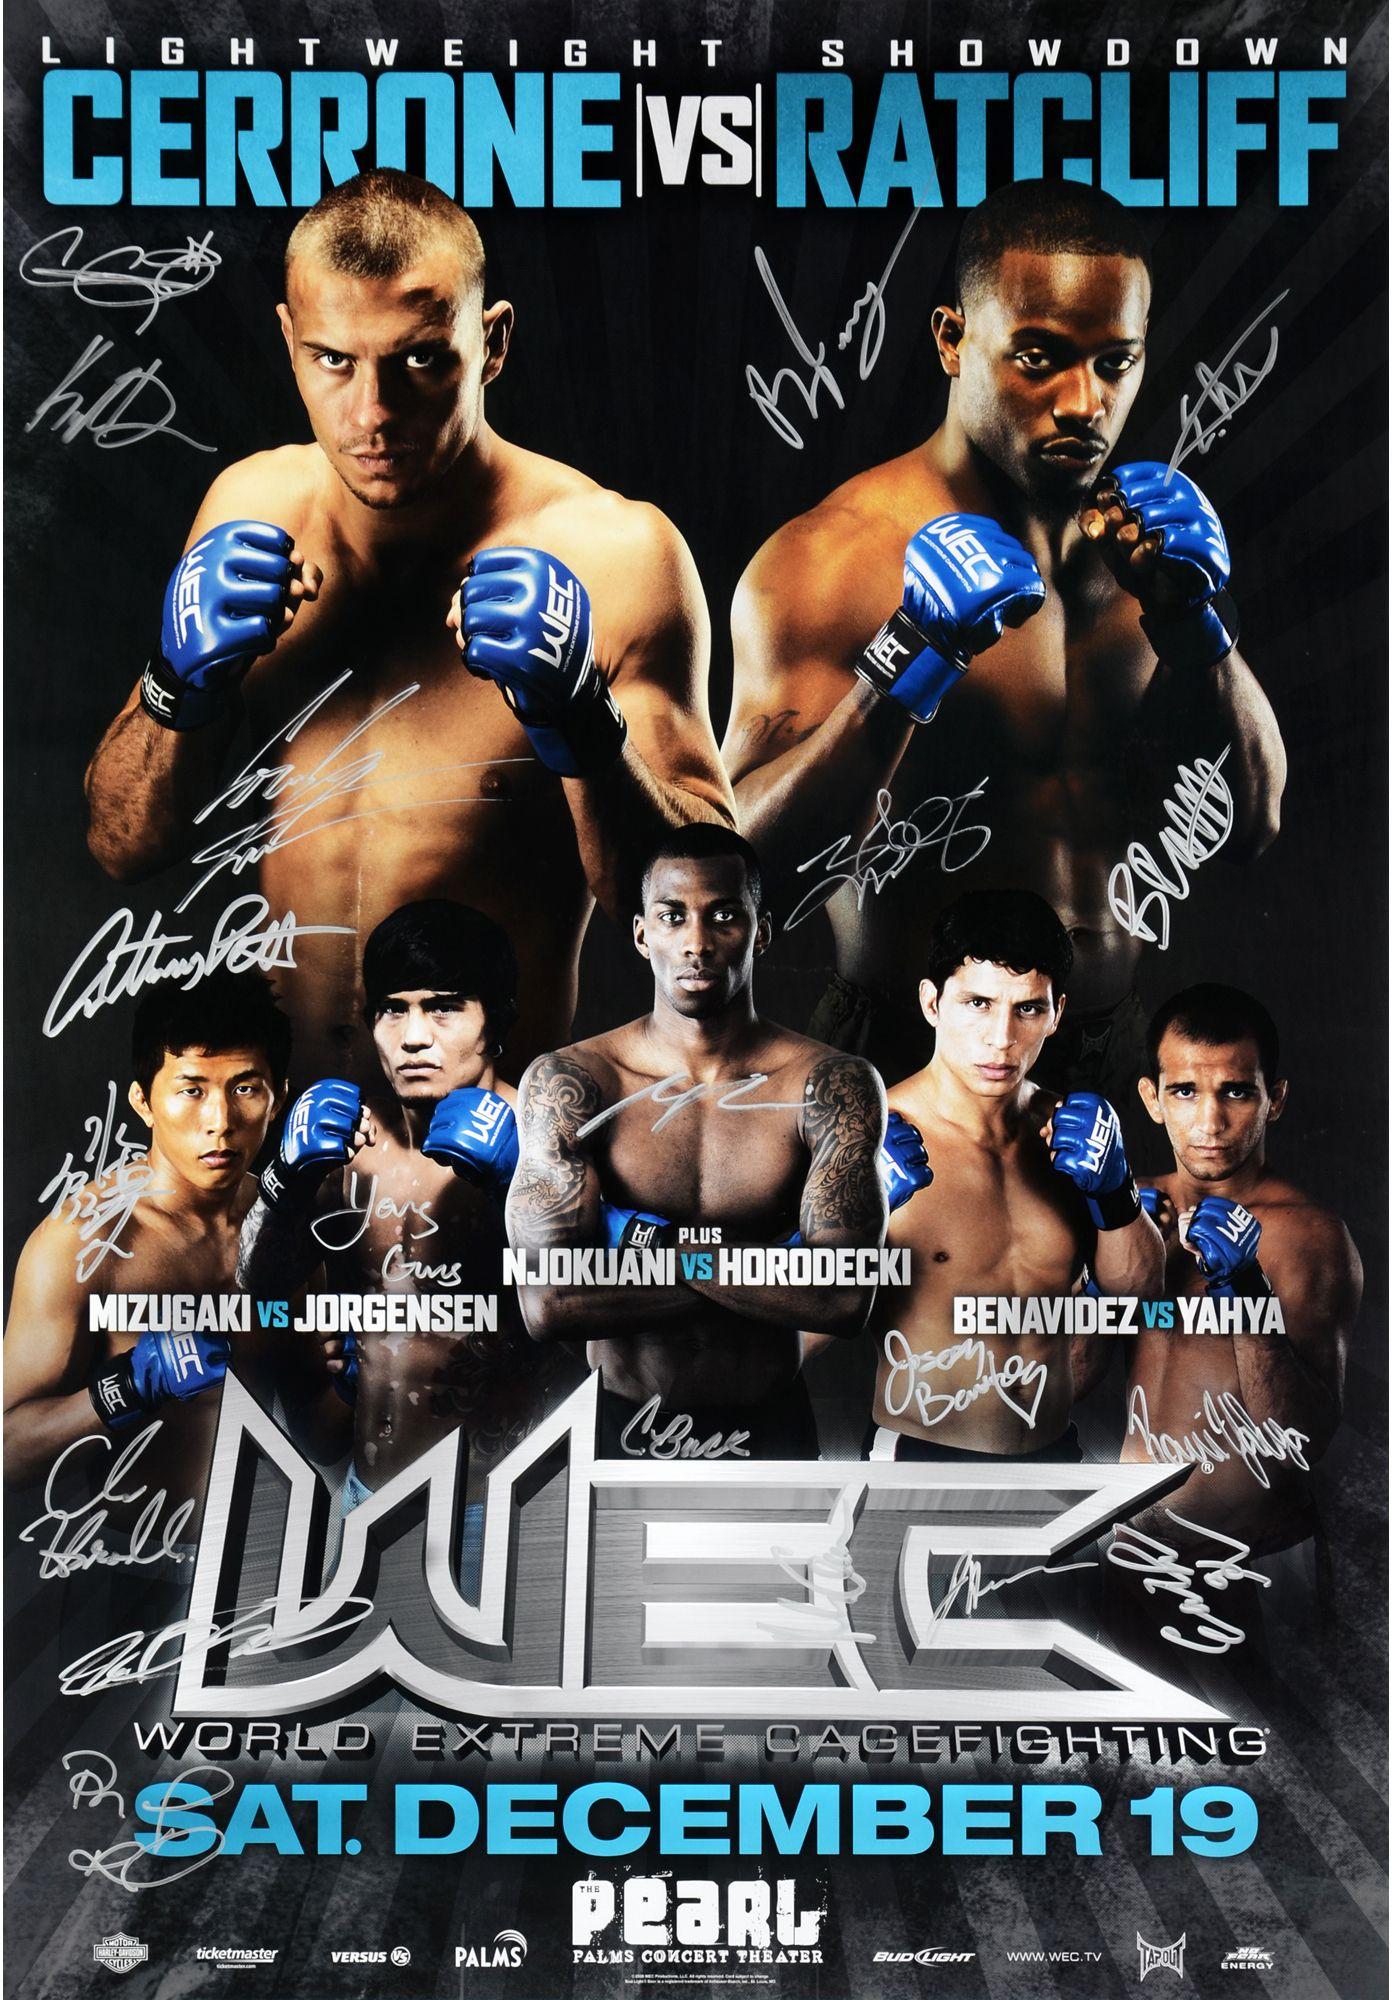 click to zoom Ufc poster, Benavidez, Event poster